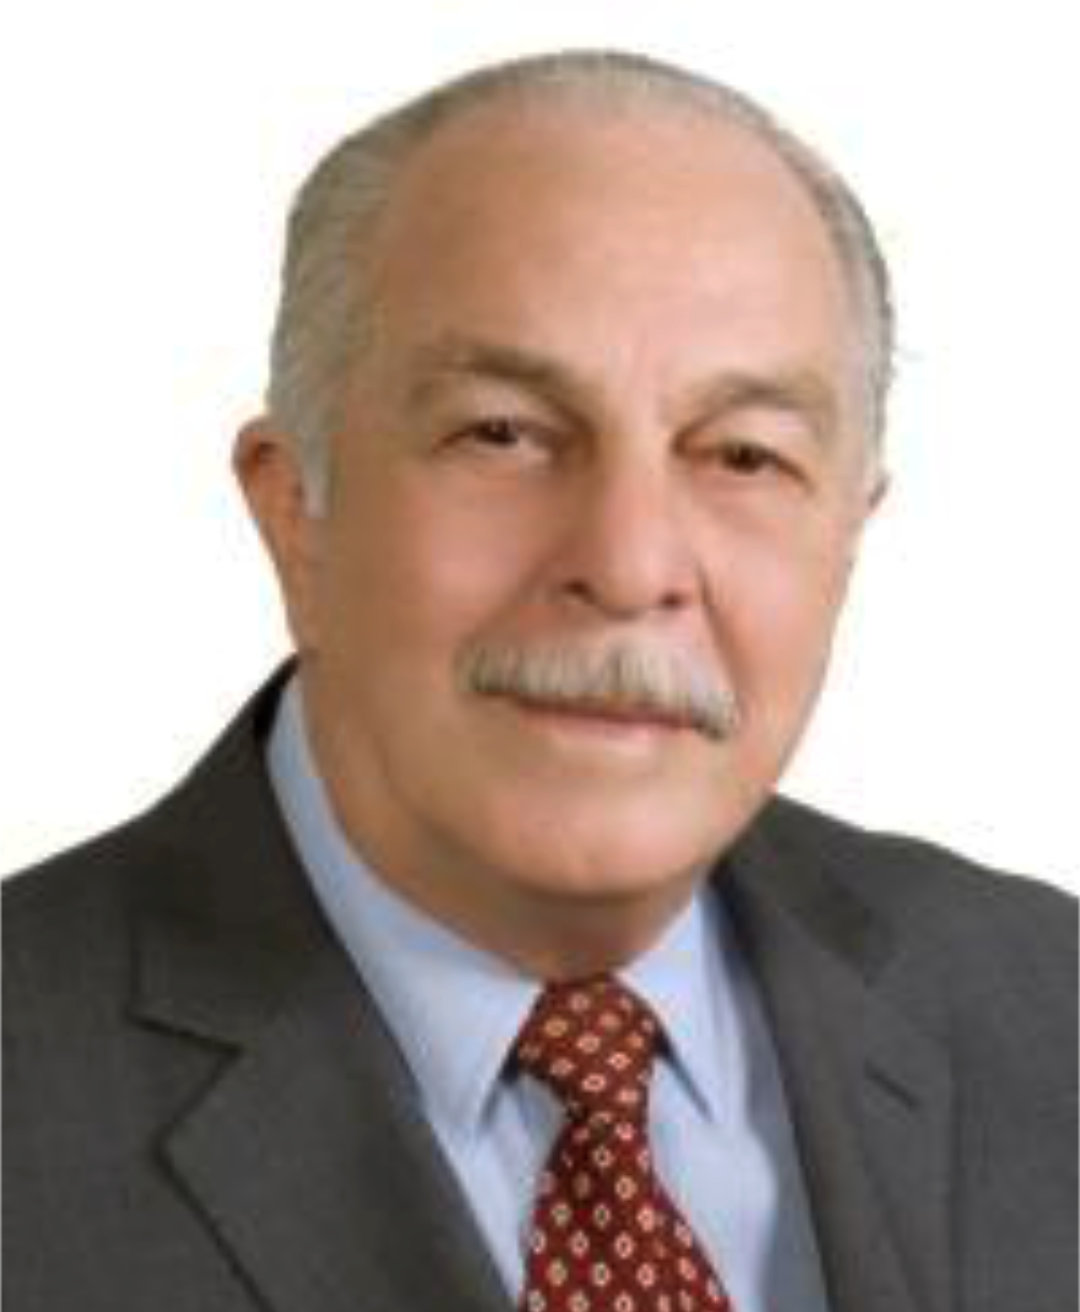 Roberto Adolfo Tauil